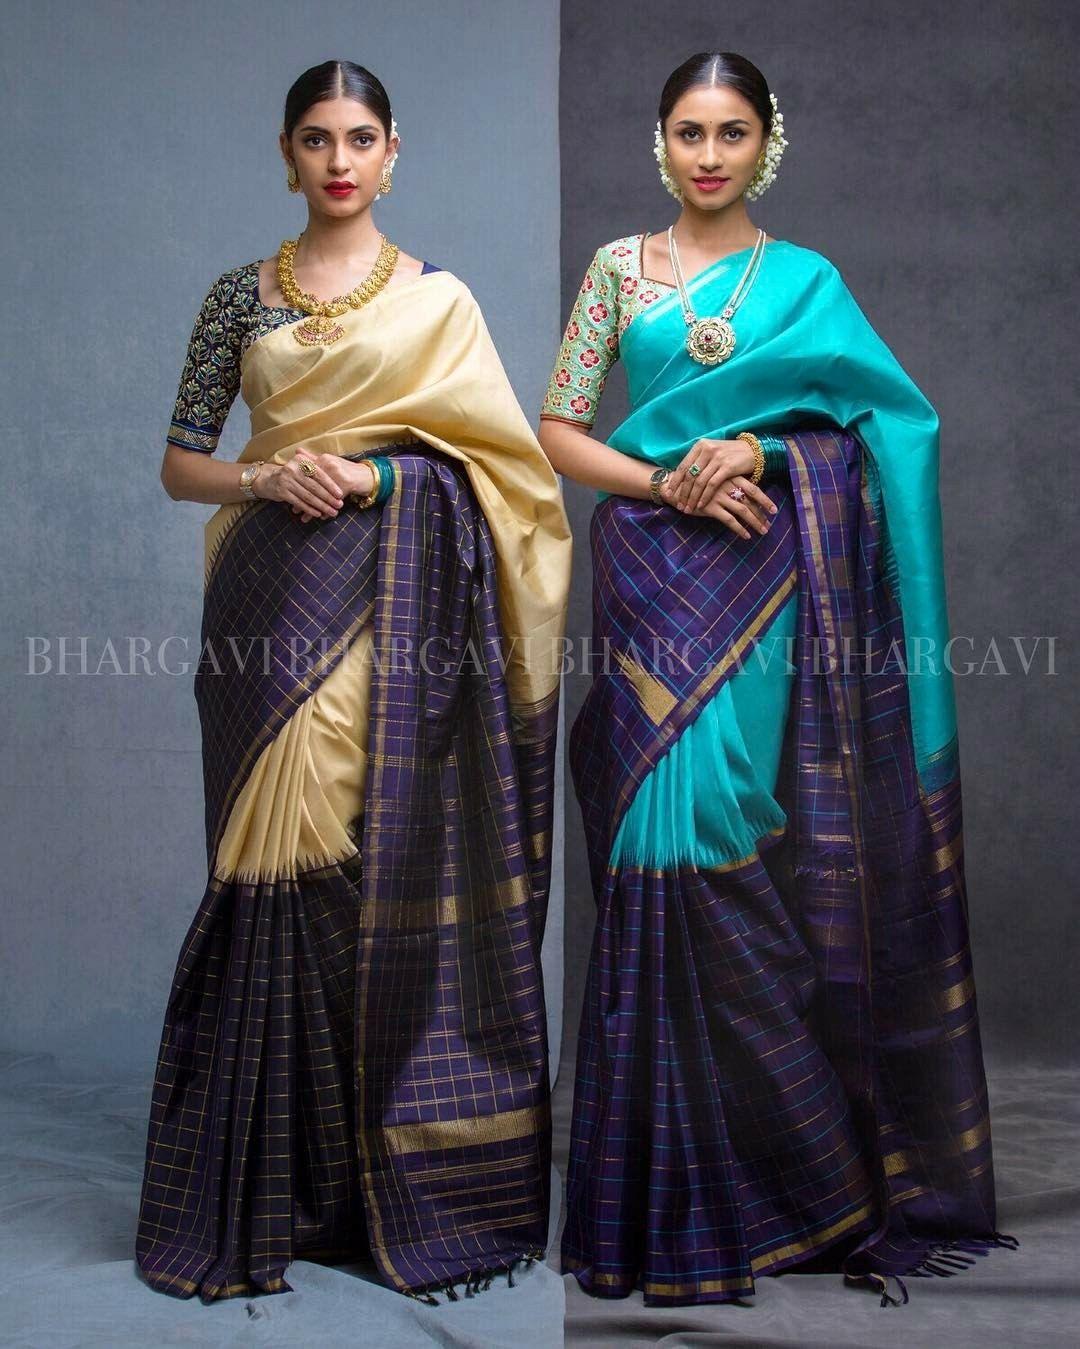 Jyothika traditional sari at shobi wedding saree blouse patterns - Jyothika Traditional Sari At Shobi Wedding Saree Blouse Patterns 44